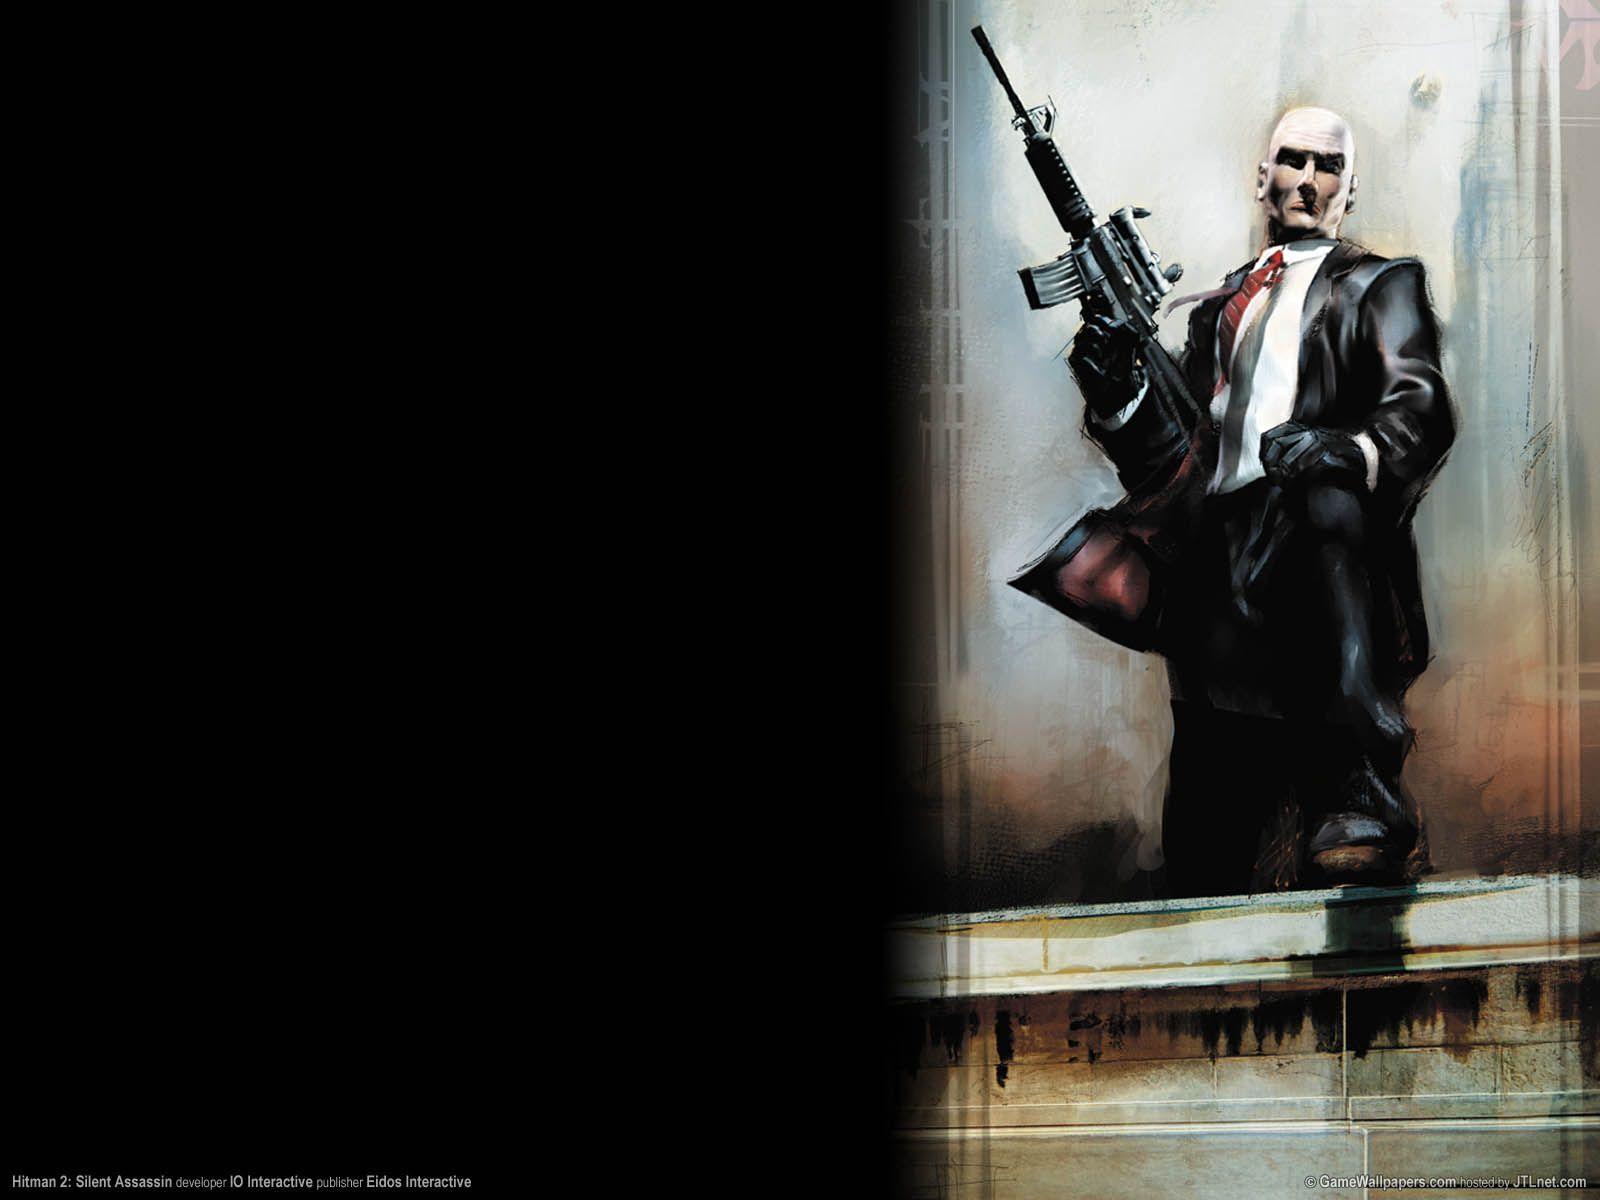 Hitman 2 Wallpapers Top Free Hitman 2 Backgrounds Wallpaperaccess